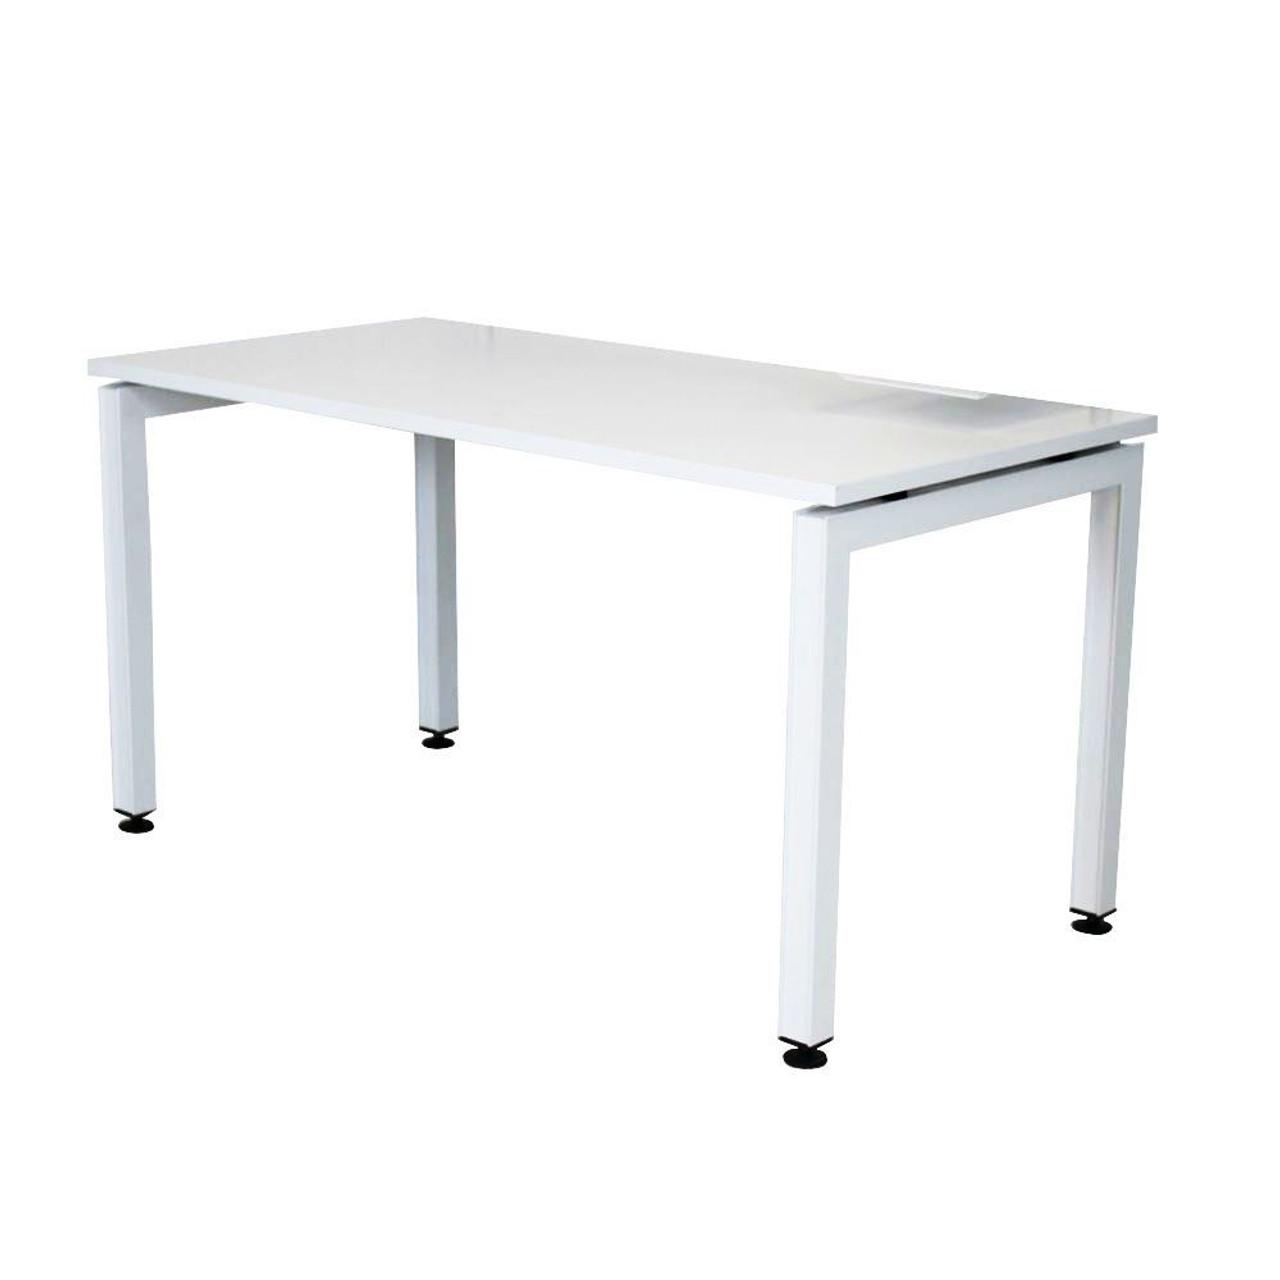 new concept a95e7 d9bf6 Herman Miller Desk and Pedestal Set (1FA-A3A-9D4)